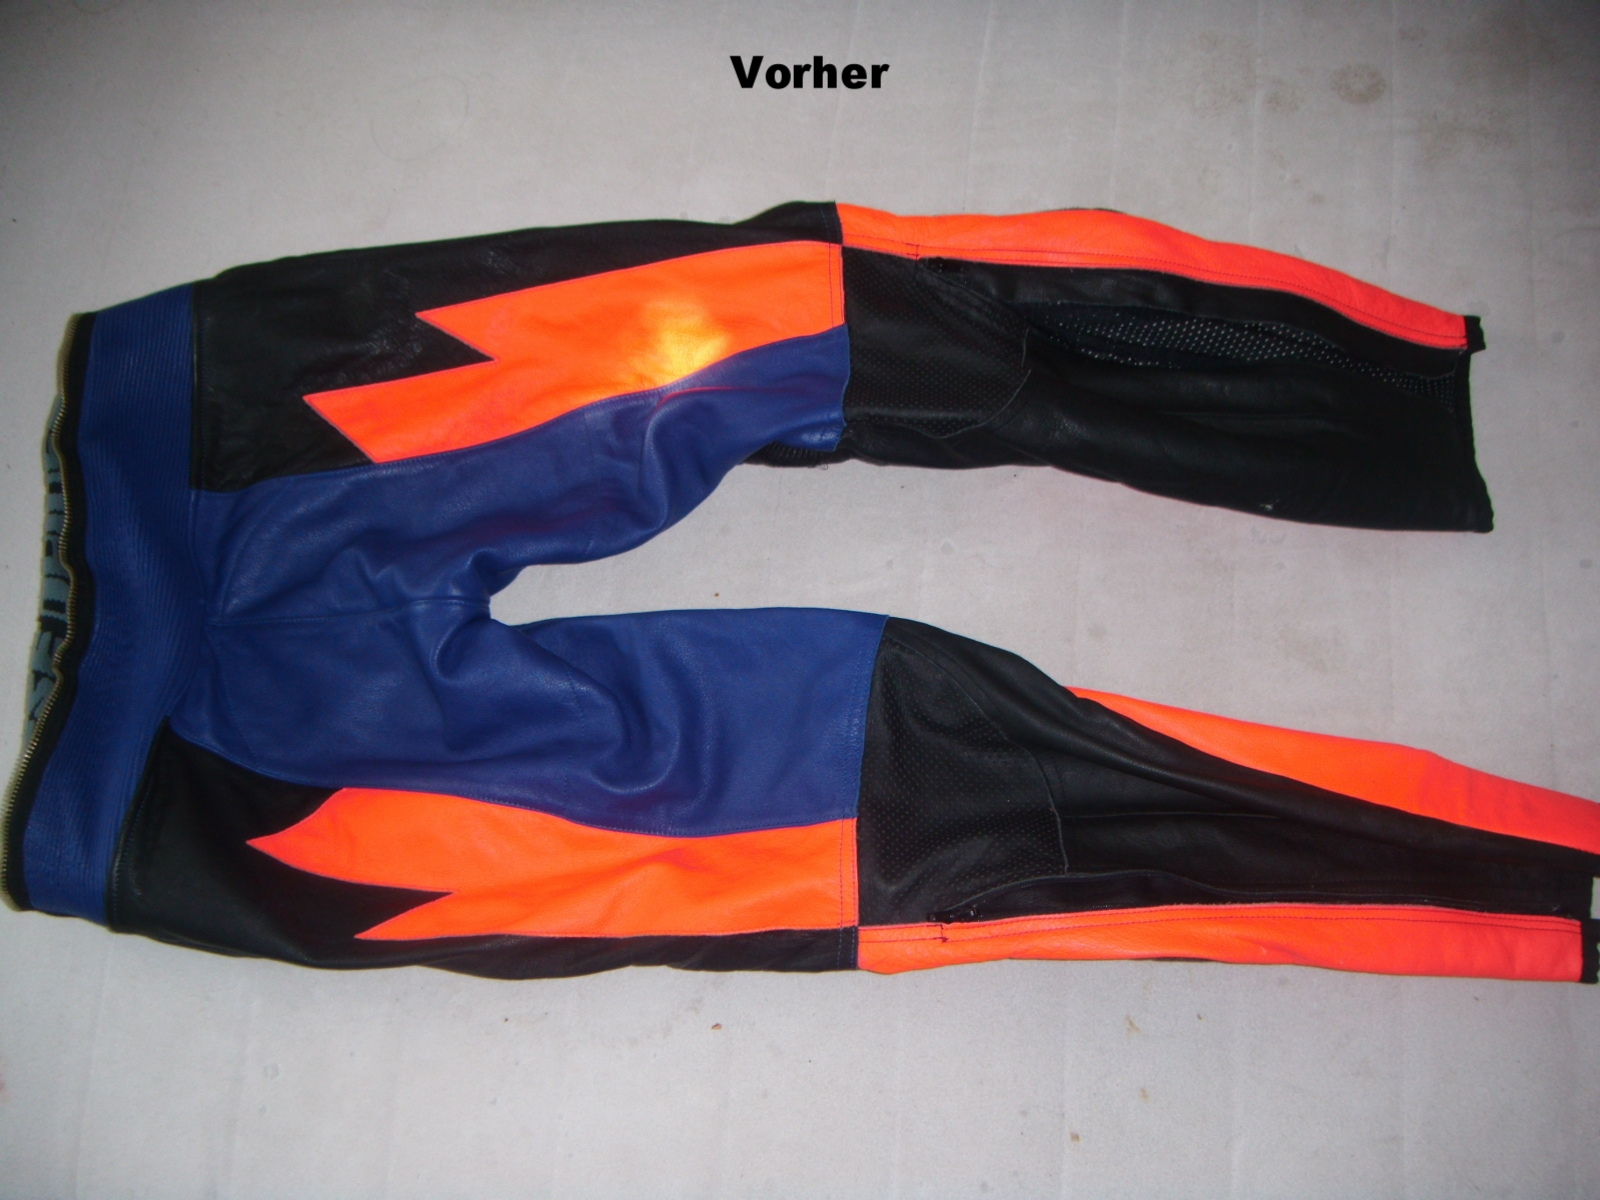 Färbenamp; Lederbekleidung Umfärben Färbenamp; Umfärben Bundesweite Lederbekleidung Bundesweite Lederbekleidung OZwkTlPiuX